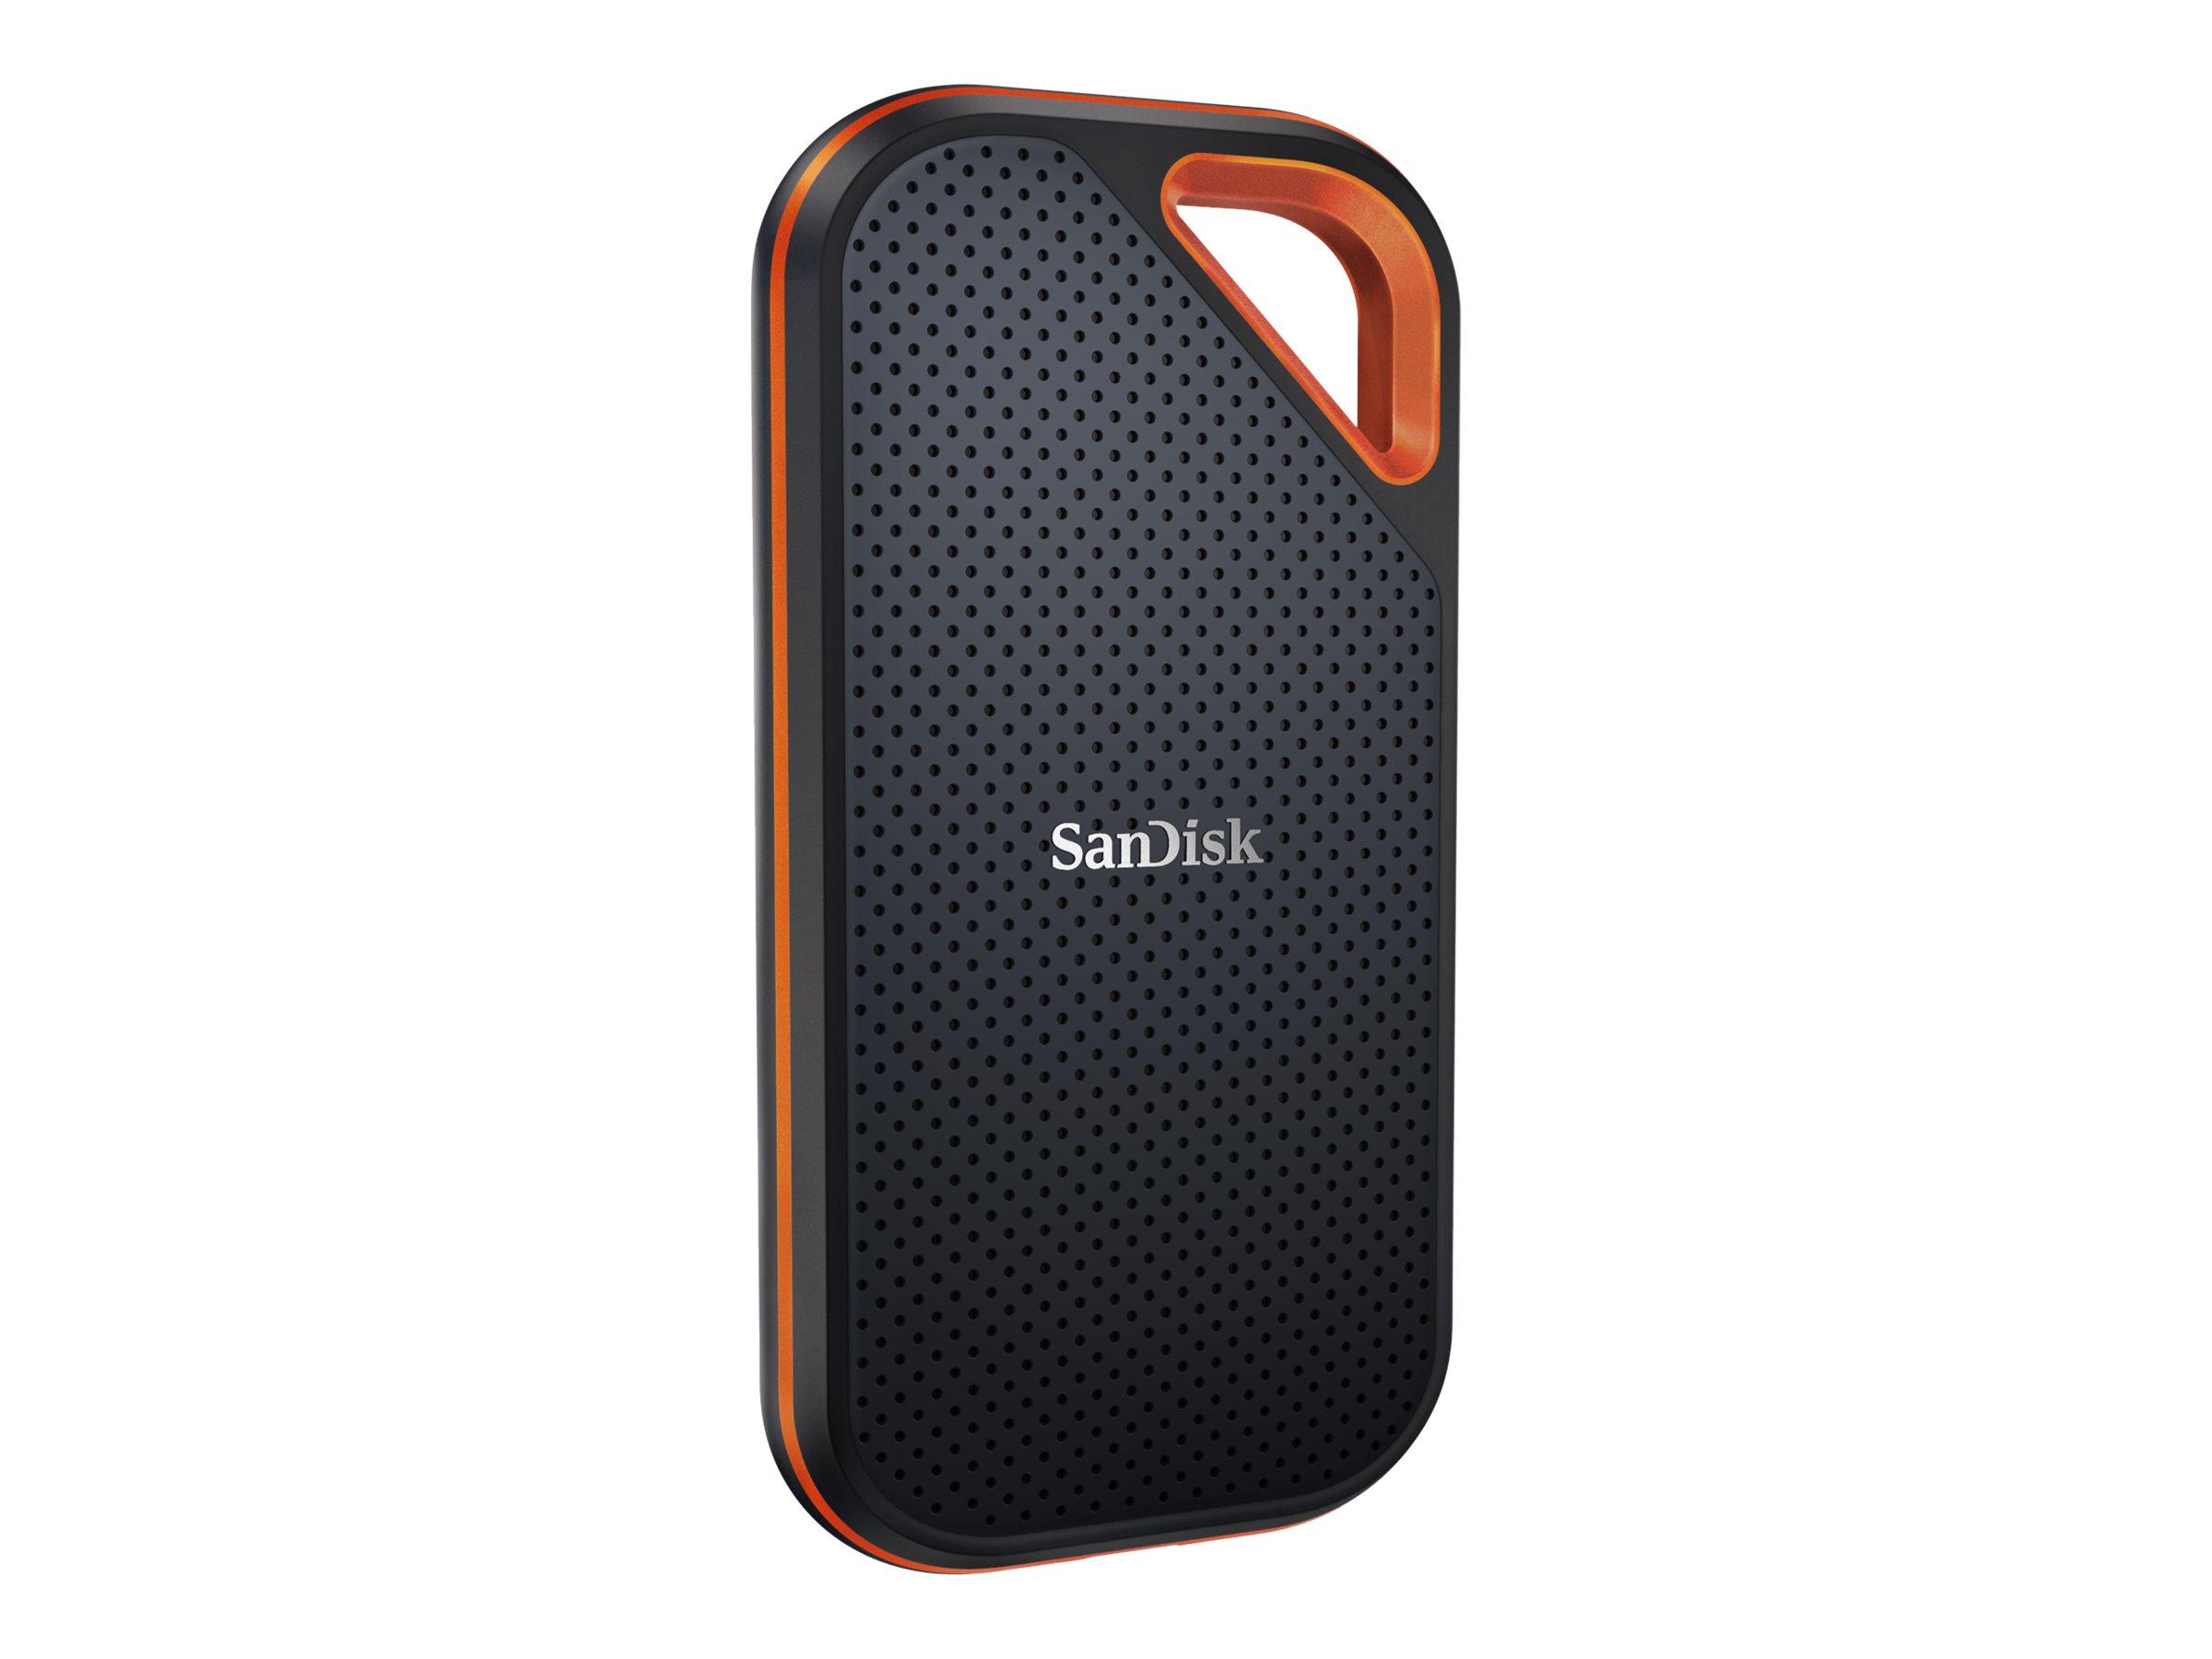 SanDisk Extreme PRO - 500 GB SSD - extern (tragbar)